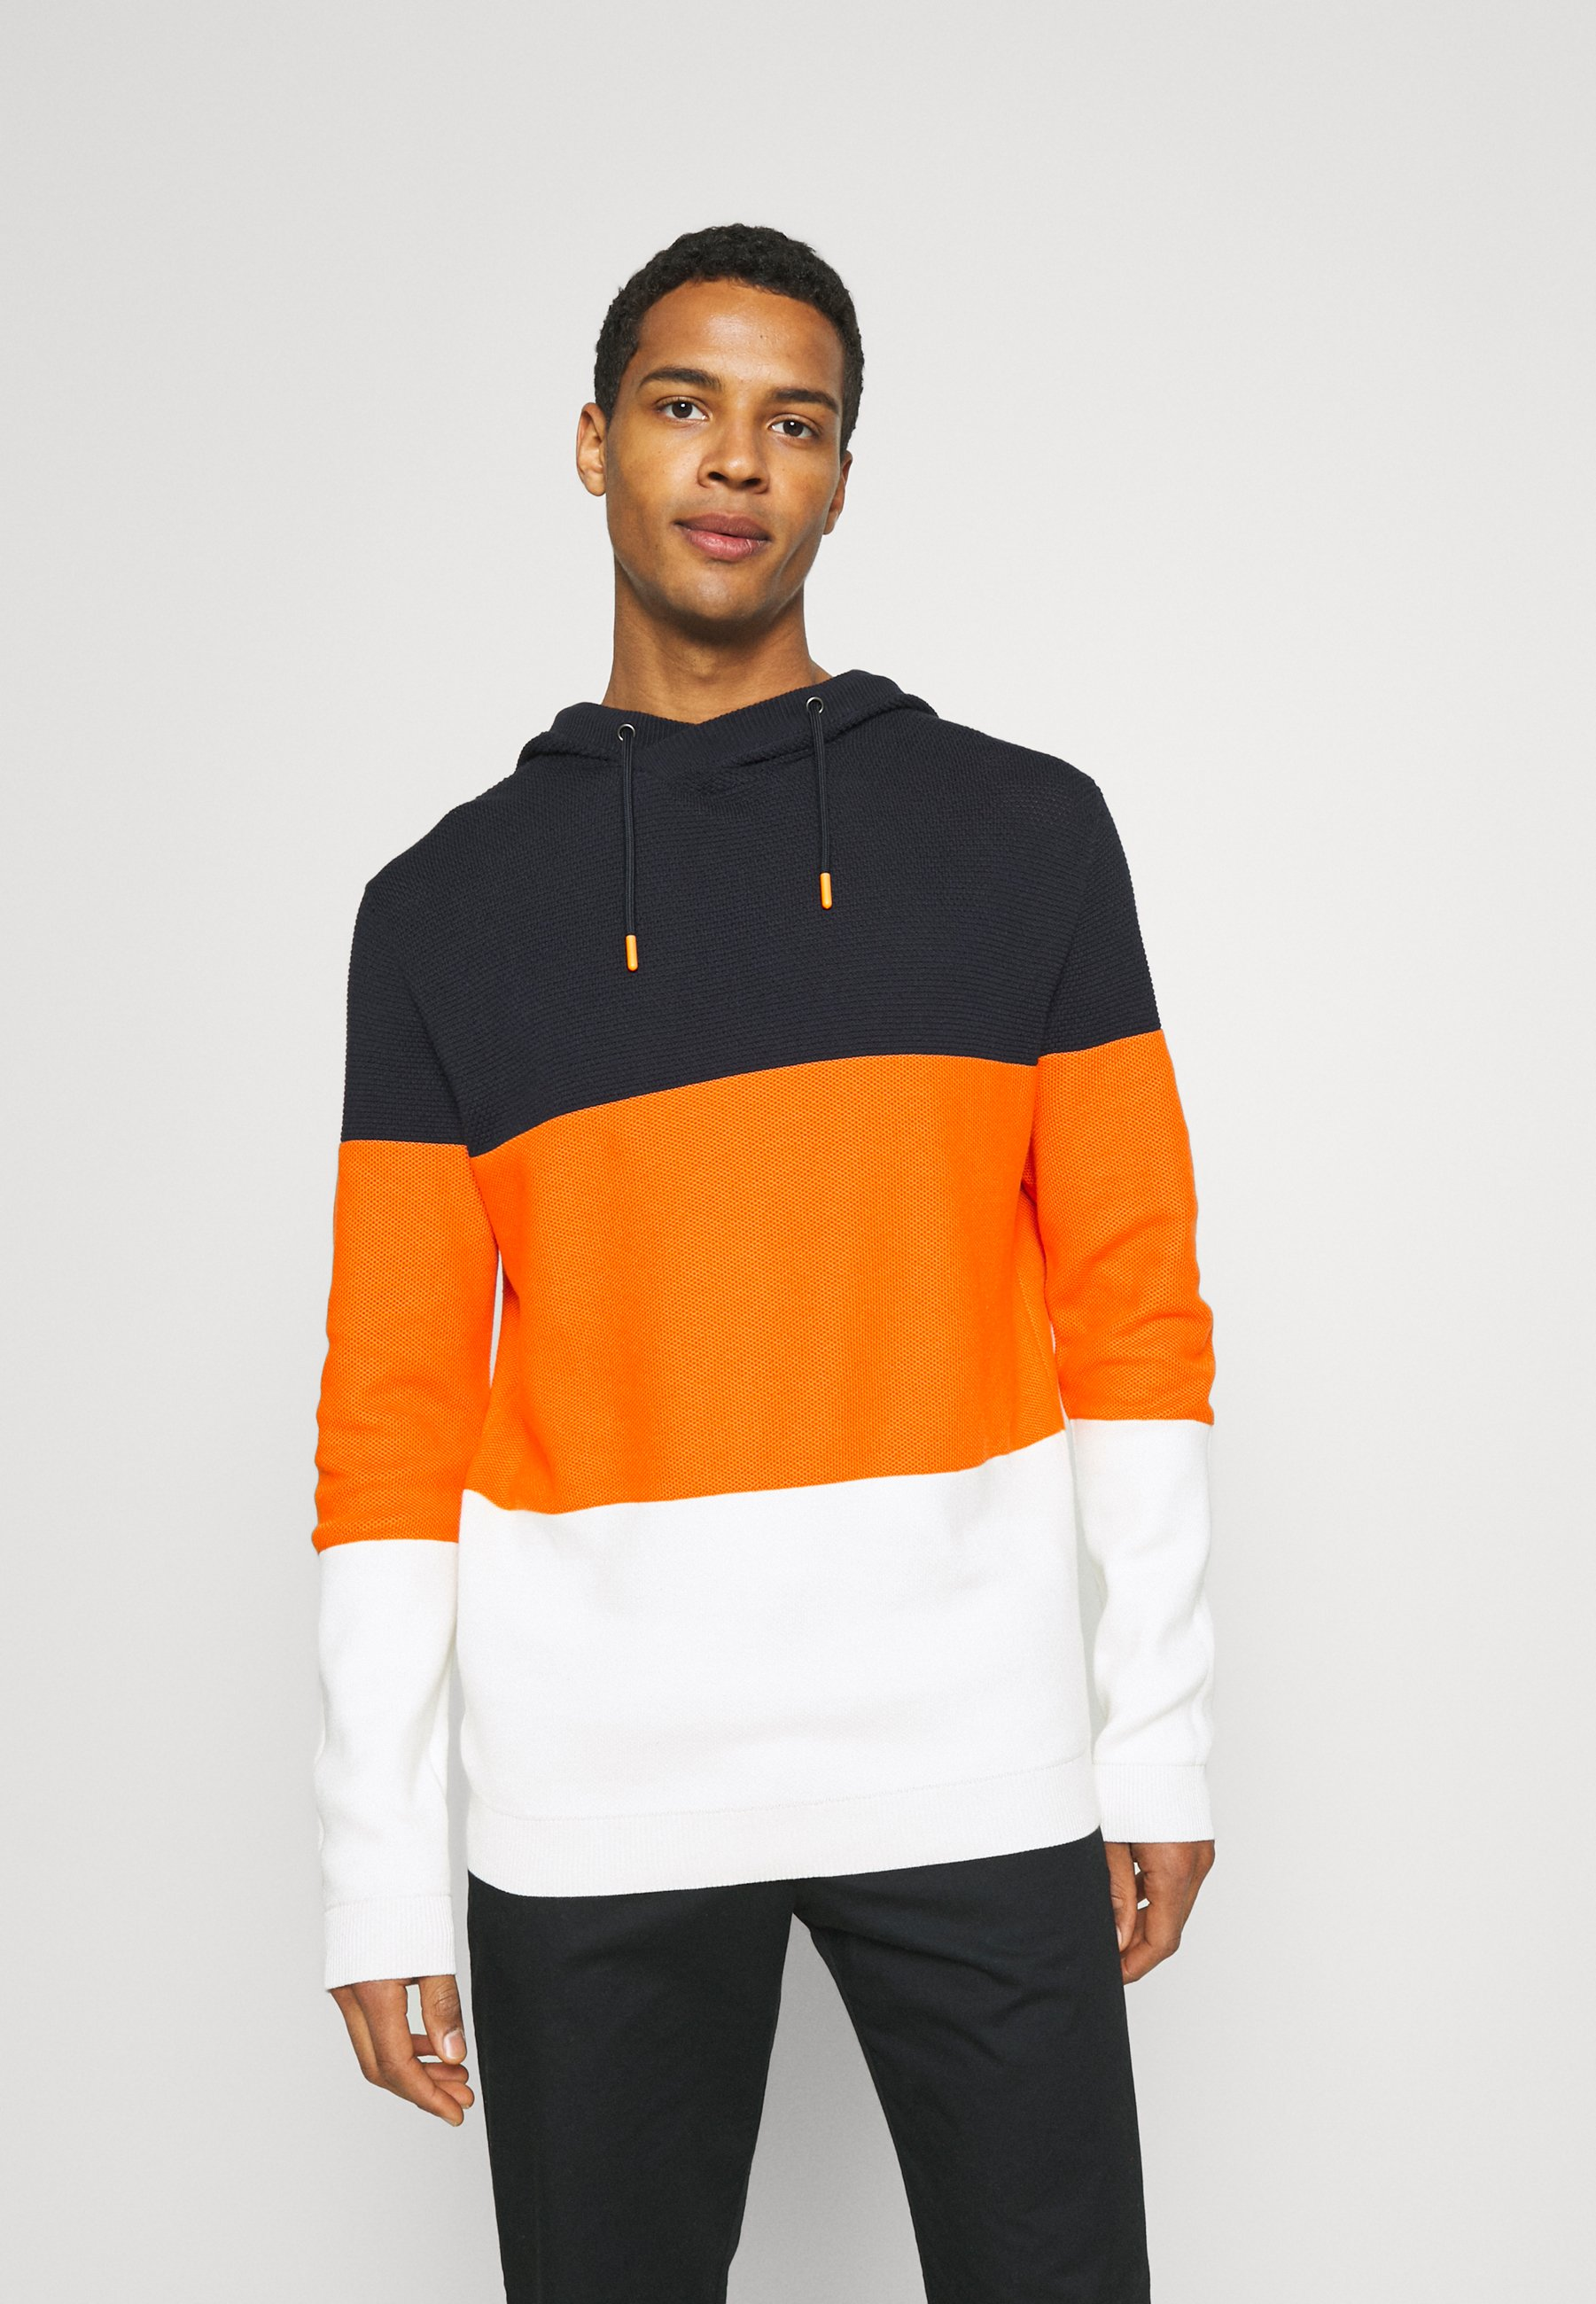 Homme HOOD - Sweat à capuche - bright orange